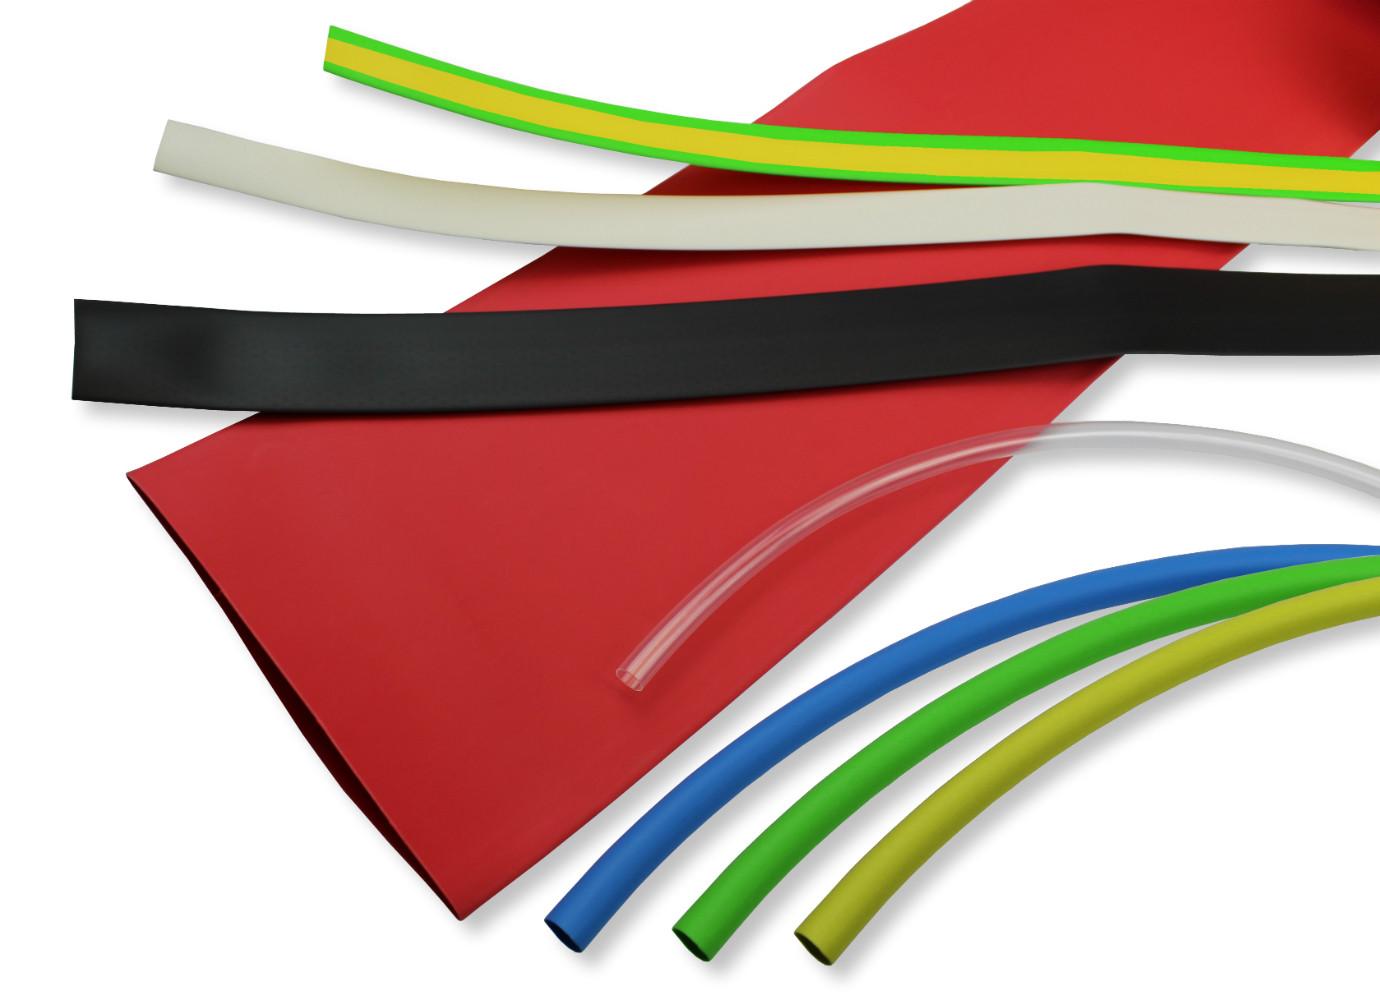 Heat Shrink Tubing 3:1 Ratio HSP3 size 24.0mm I.D / 8.0mm I.D Black